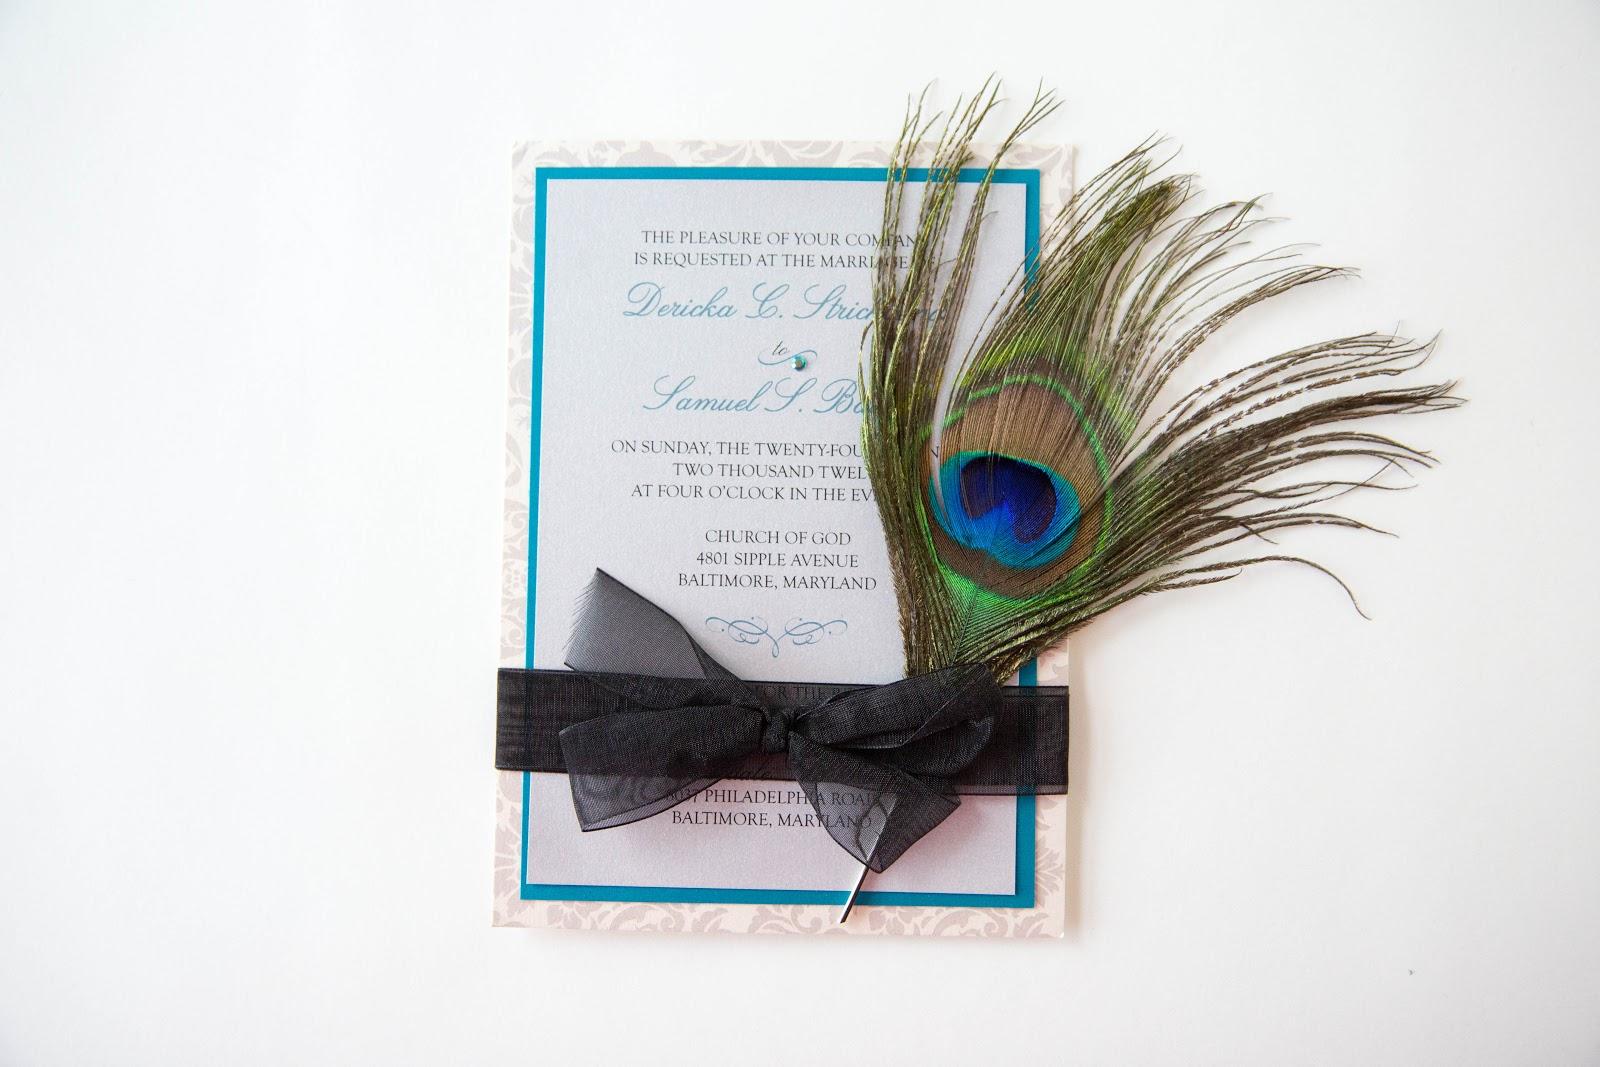 Peacock feather wedding invitation wedding invitations baltimore peacock feather wedding invitation wedding invitations baltimore stopboris Gallery